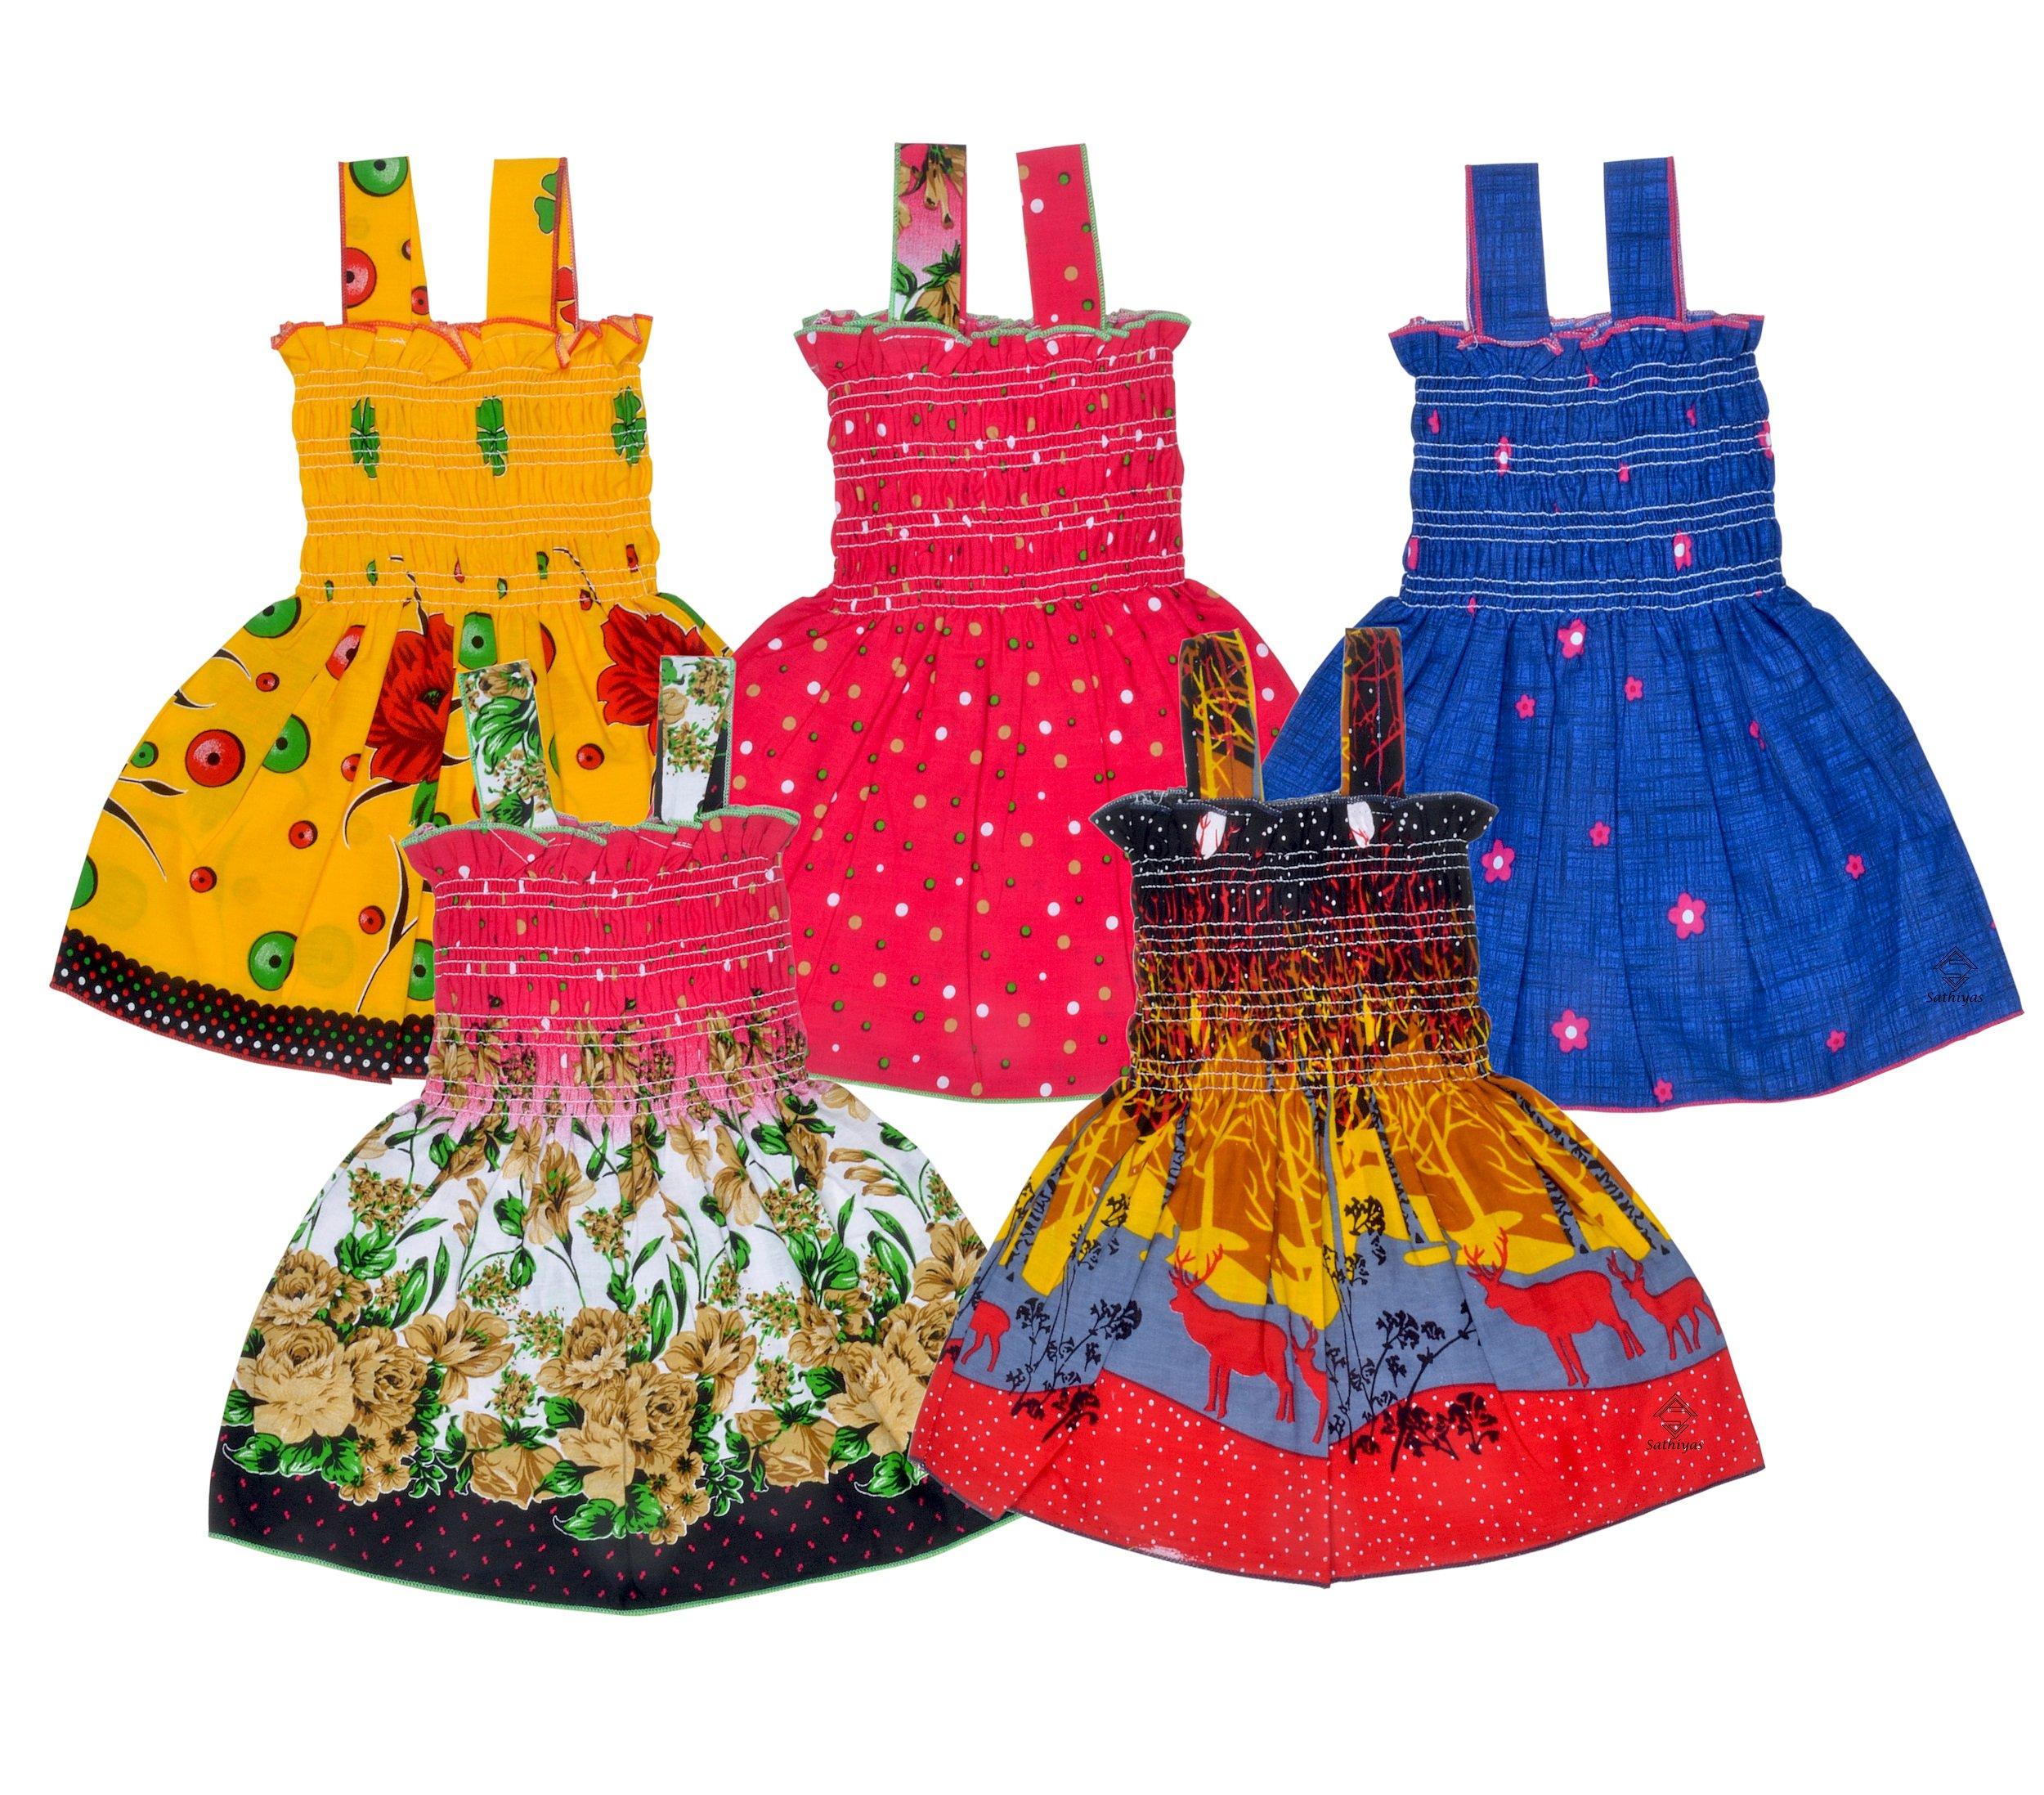 Sathiyas Baby Girls Cotton Gathered Dresses (Multicolor, Set of 5) product image